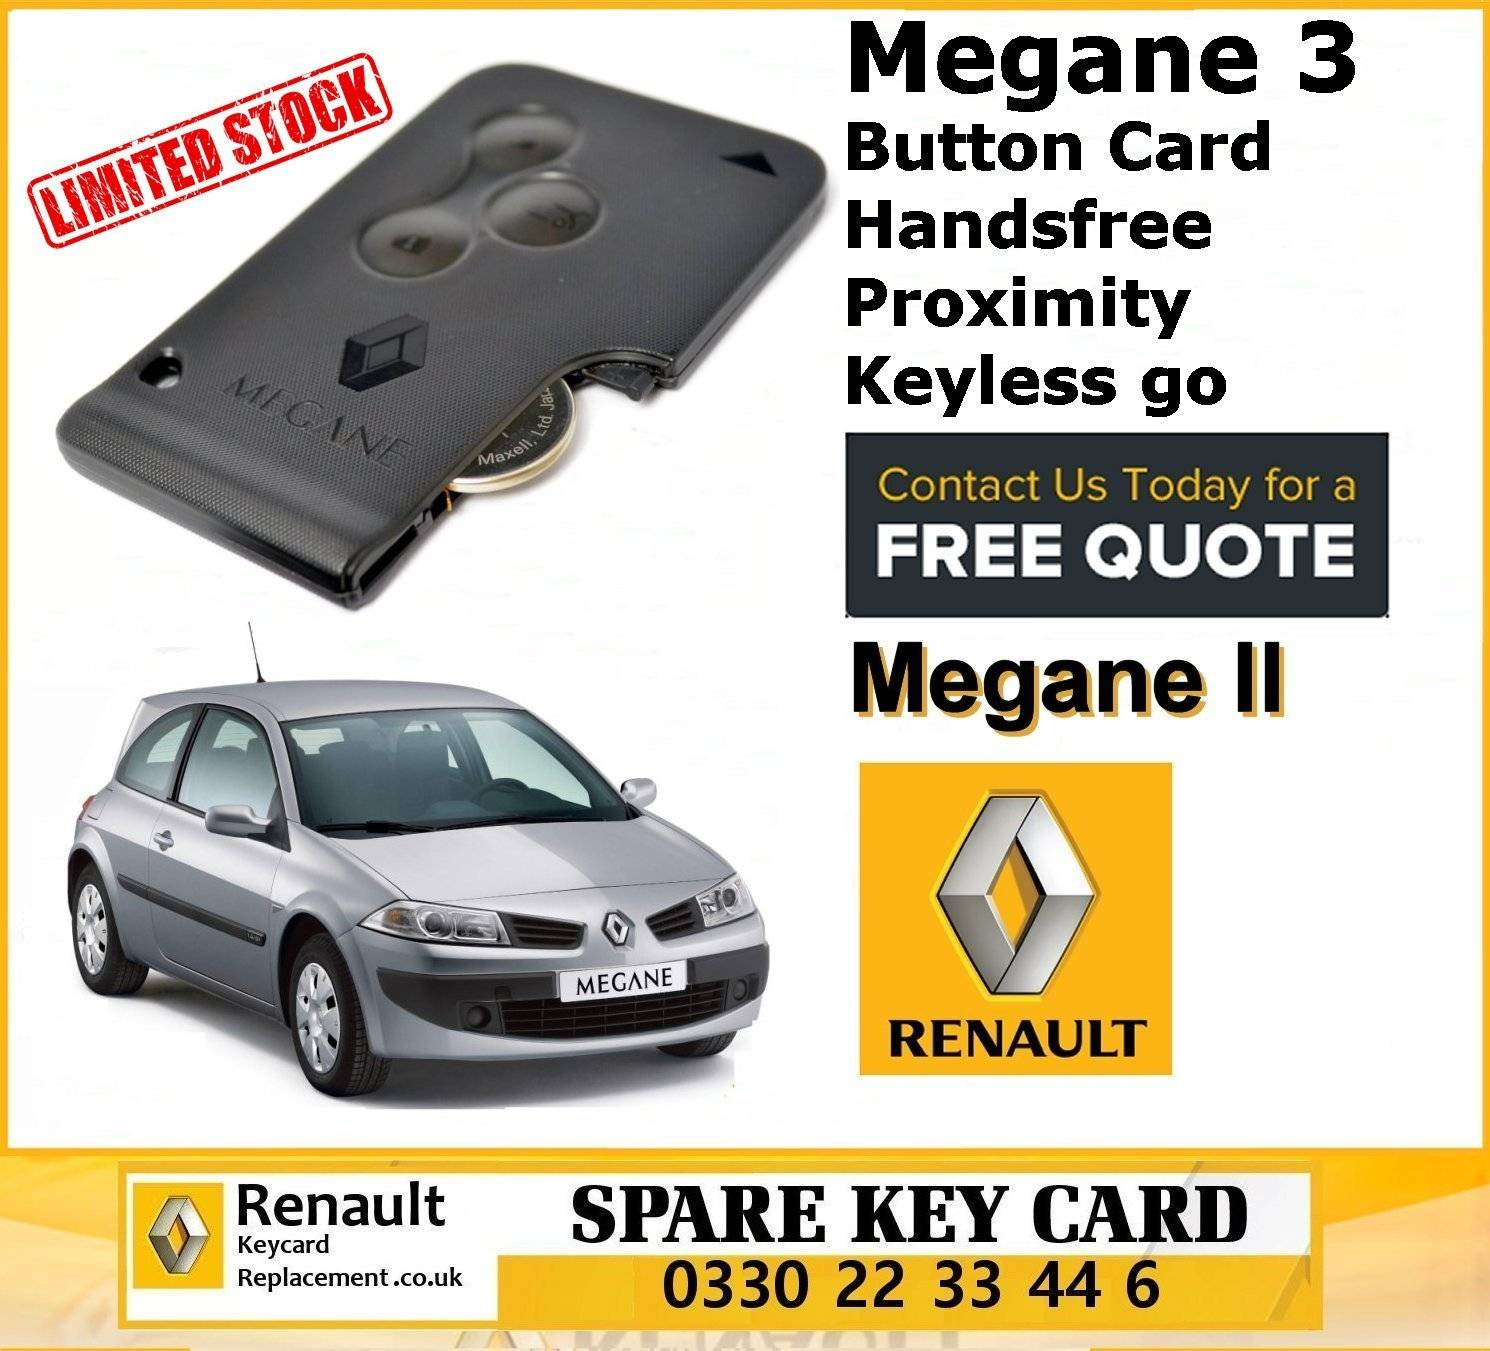 Renault Replacement Remote Key Card Stockport Bramhall, Bredbury, Cheadle, Gatley, Hazel Grove, Heaton Chapel, Heaton Mersey, Heaton Moor, Heaton Norris, Marple, Marple Bridge, Mellor, Reddish, Romiley